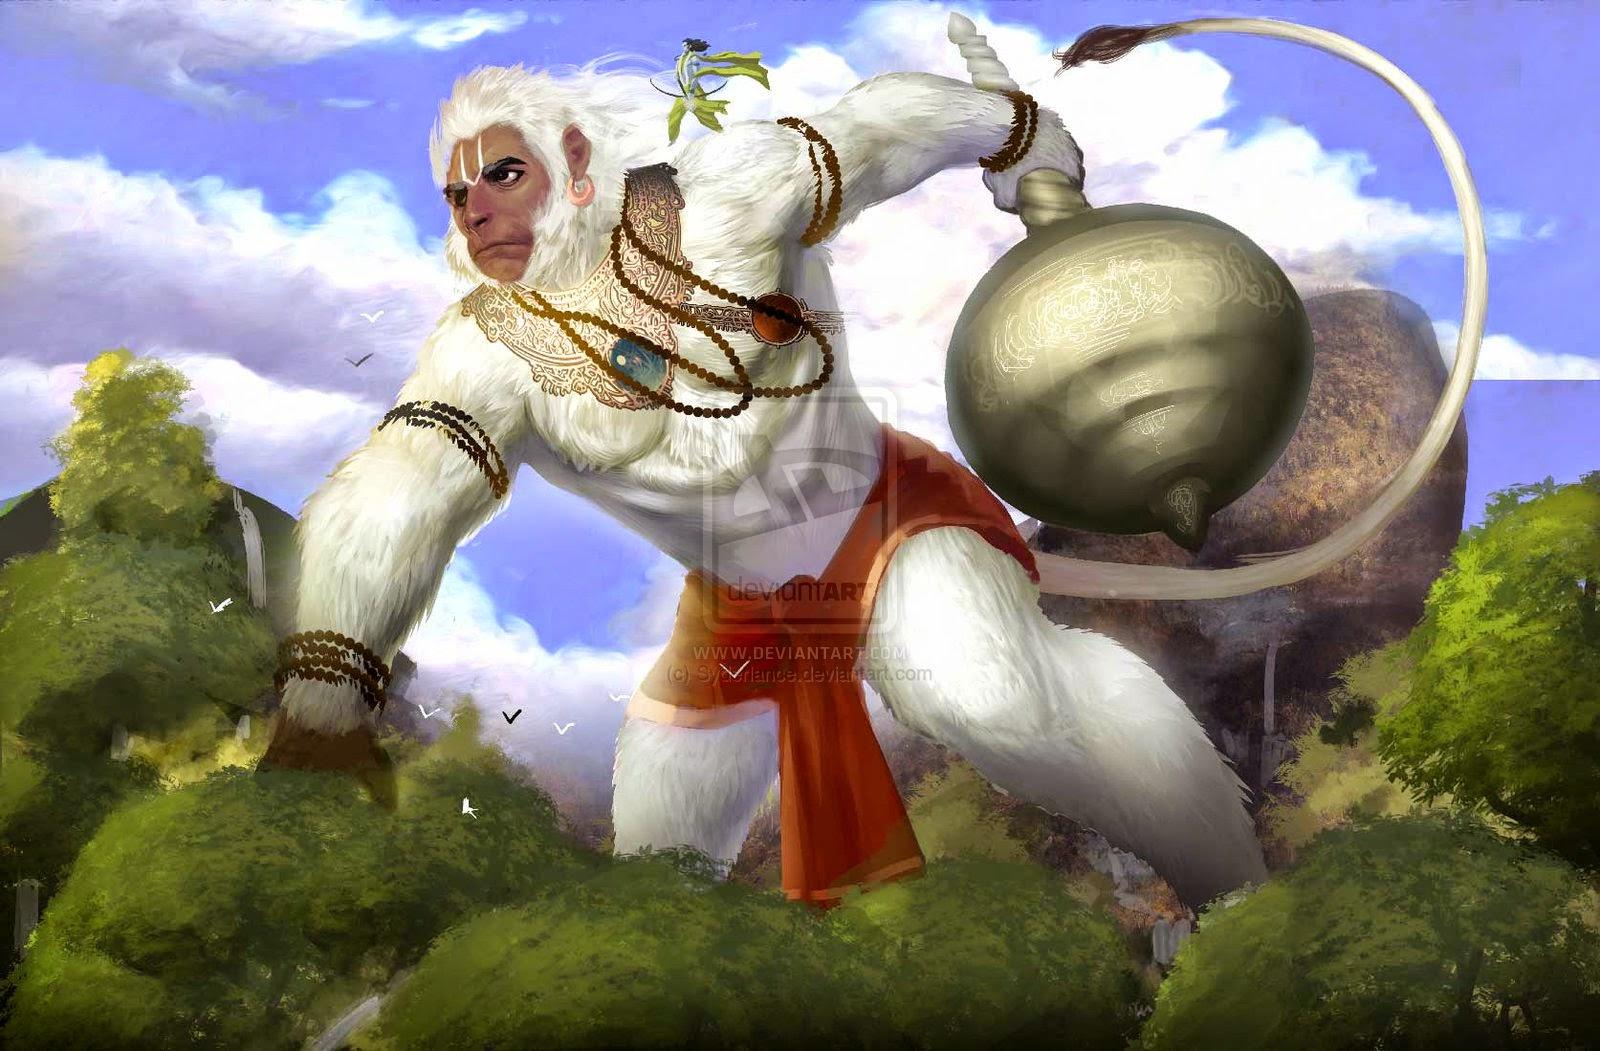 Lord hanuman images hd 1080p